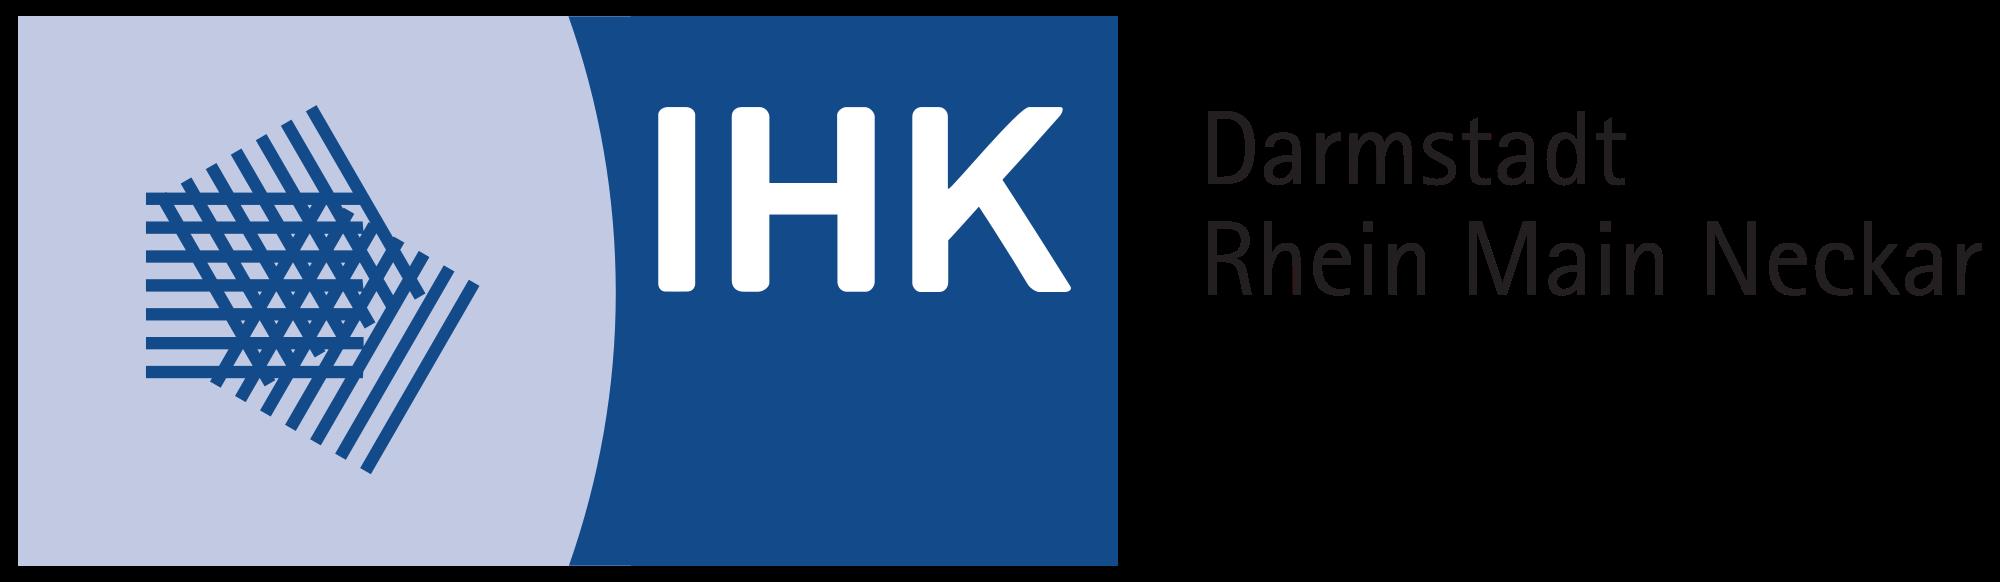 IHK Darmstadt Rhein Main Neckar Logo